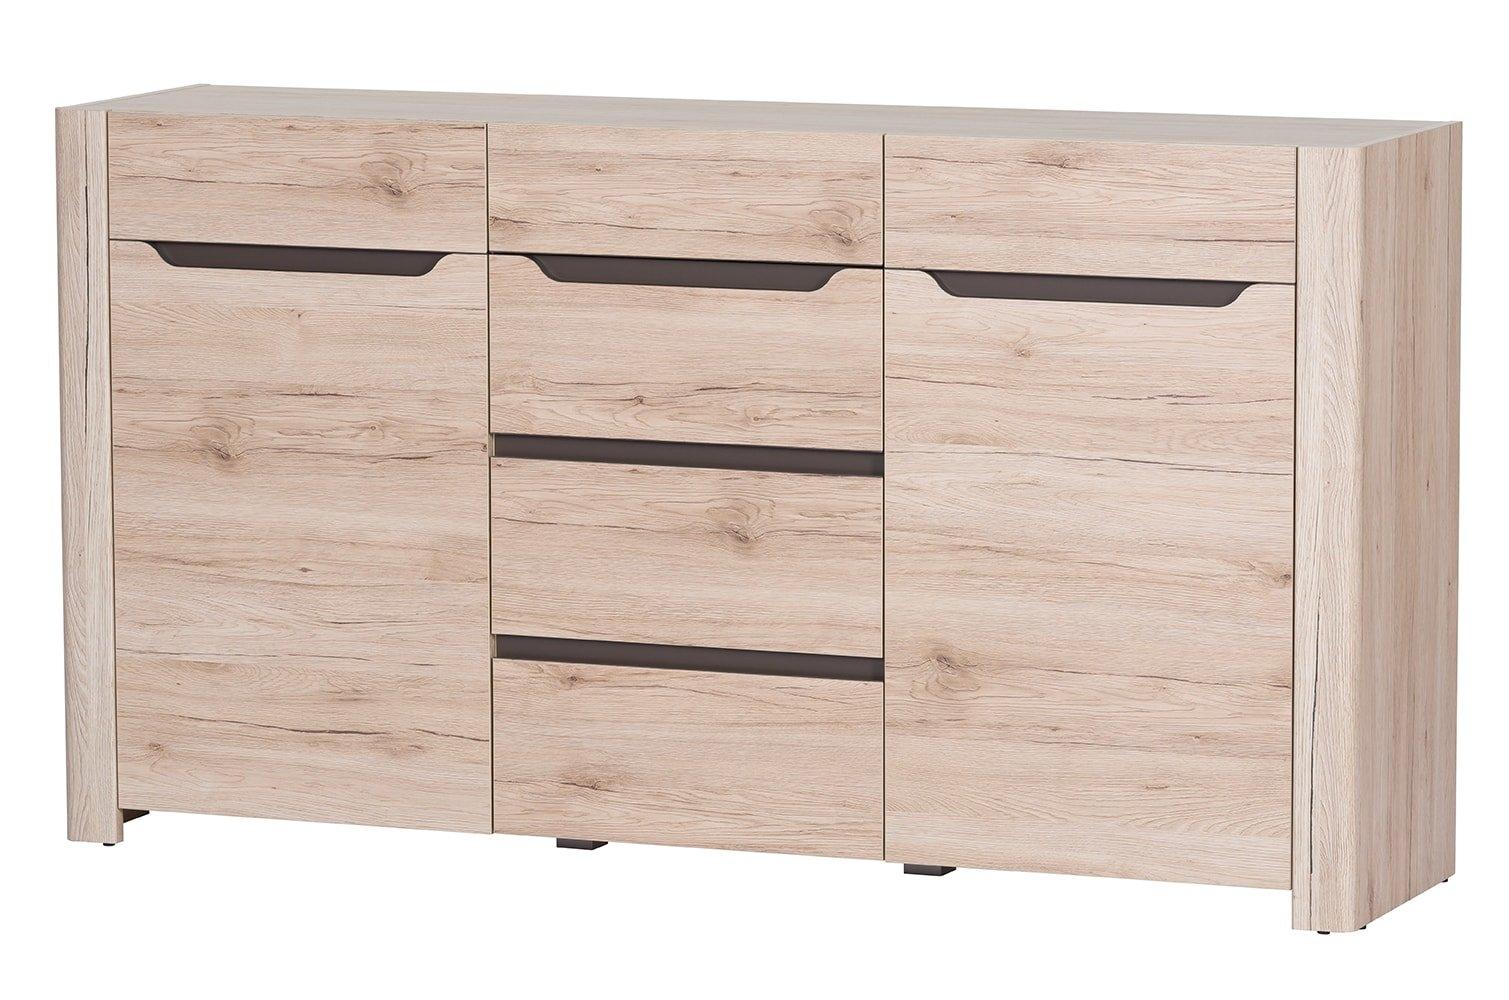 Comoda din pal, cu 4 sertare si 2 usi Desjo 10 Stejar San Remo, l170xA42xH93 cm